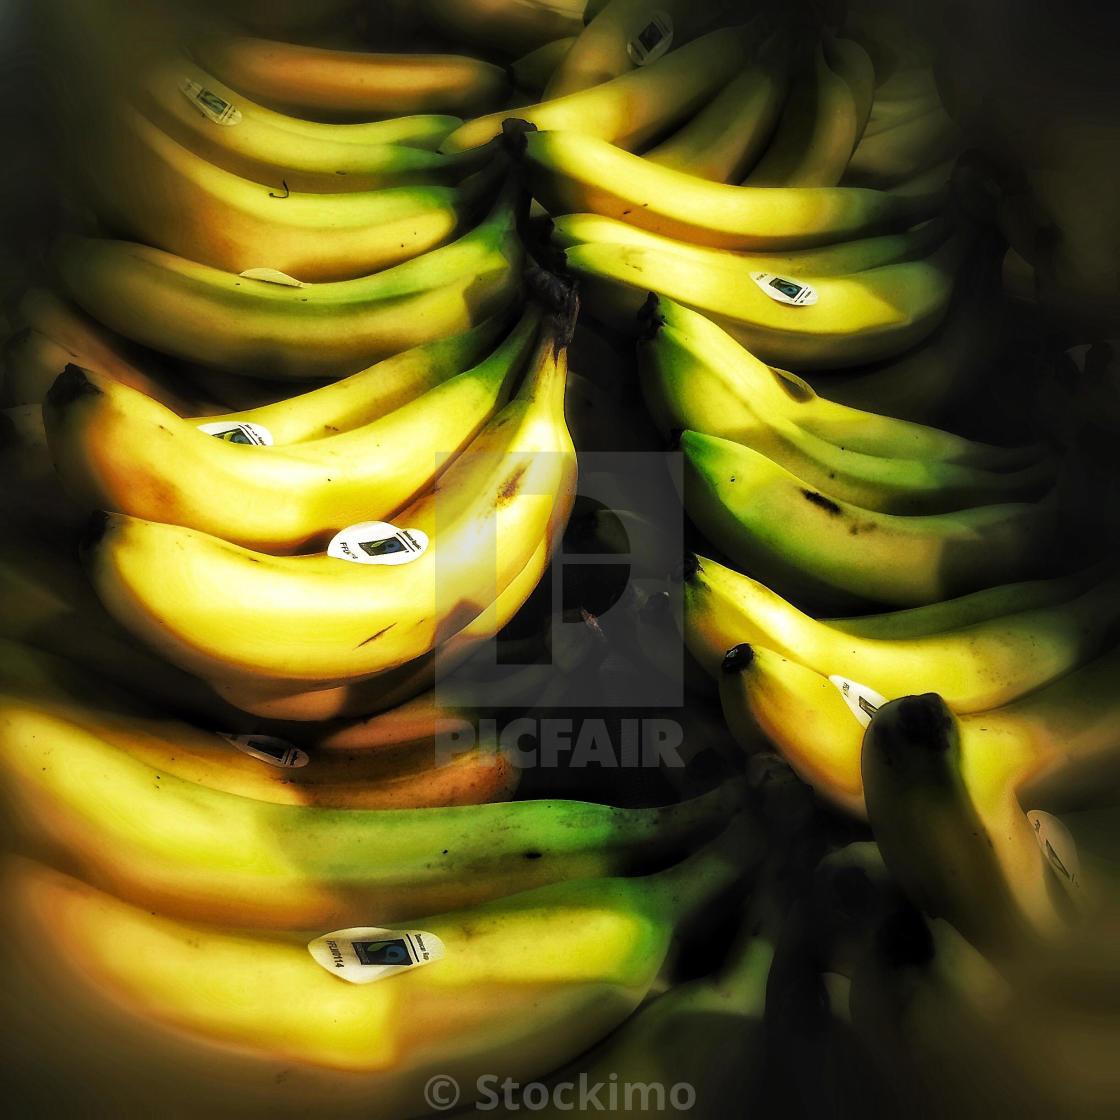 Fair trade bananas on supermarket shelf - License for £31.00 on Picfair